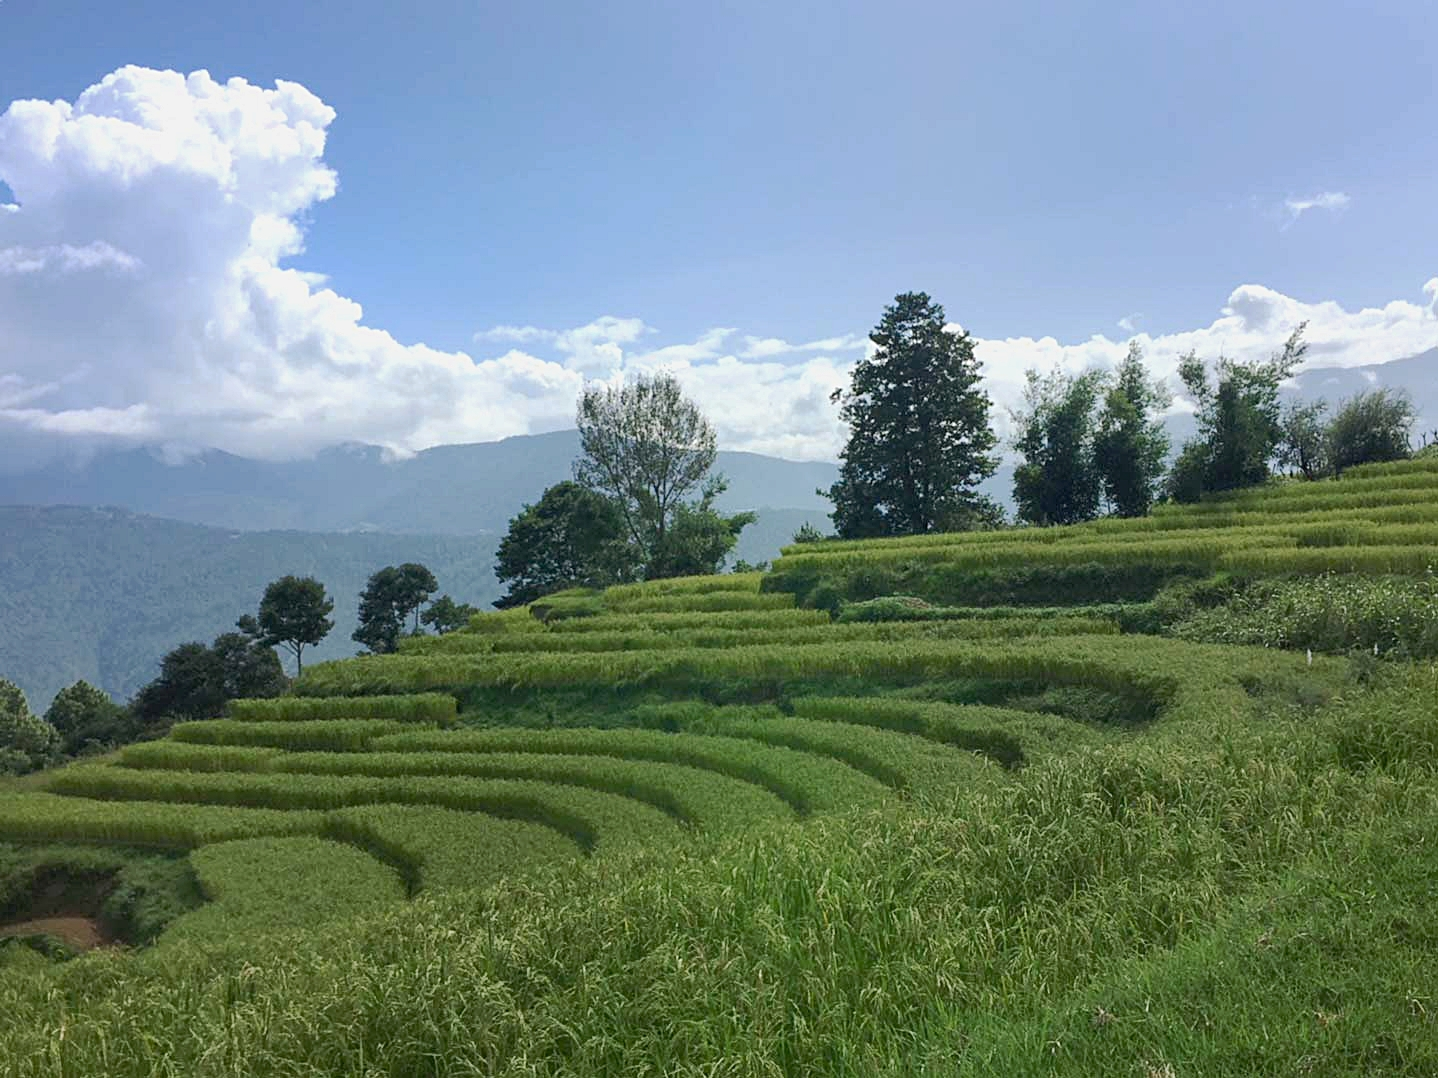 Rice-paddies-1-IMG_2659.jpg